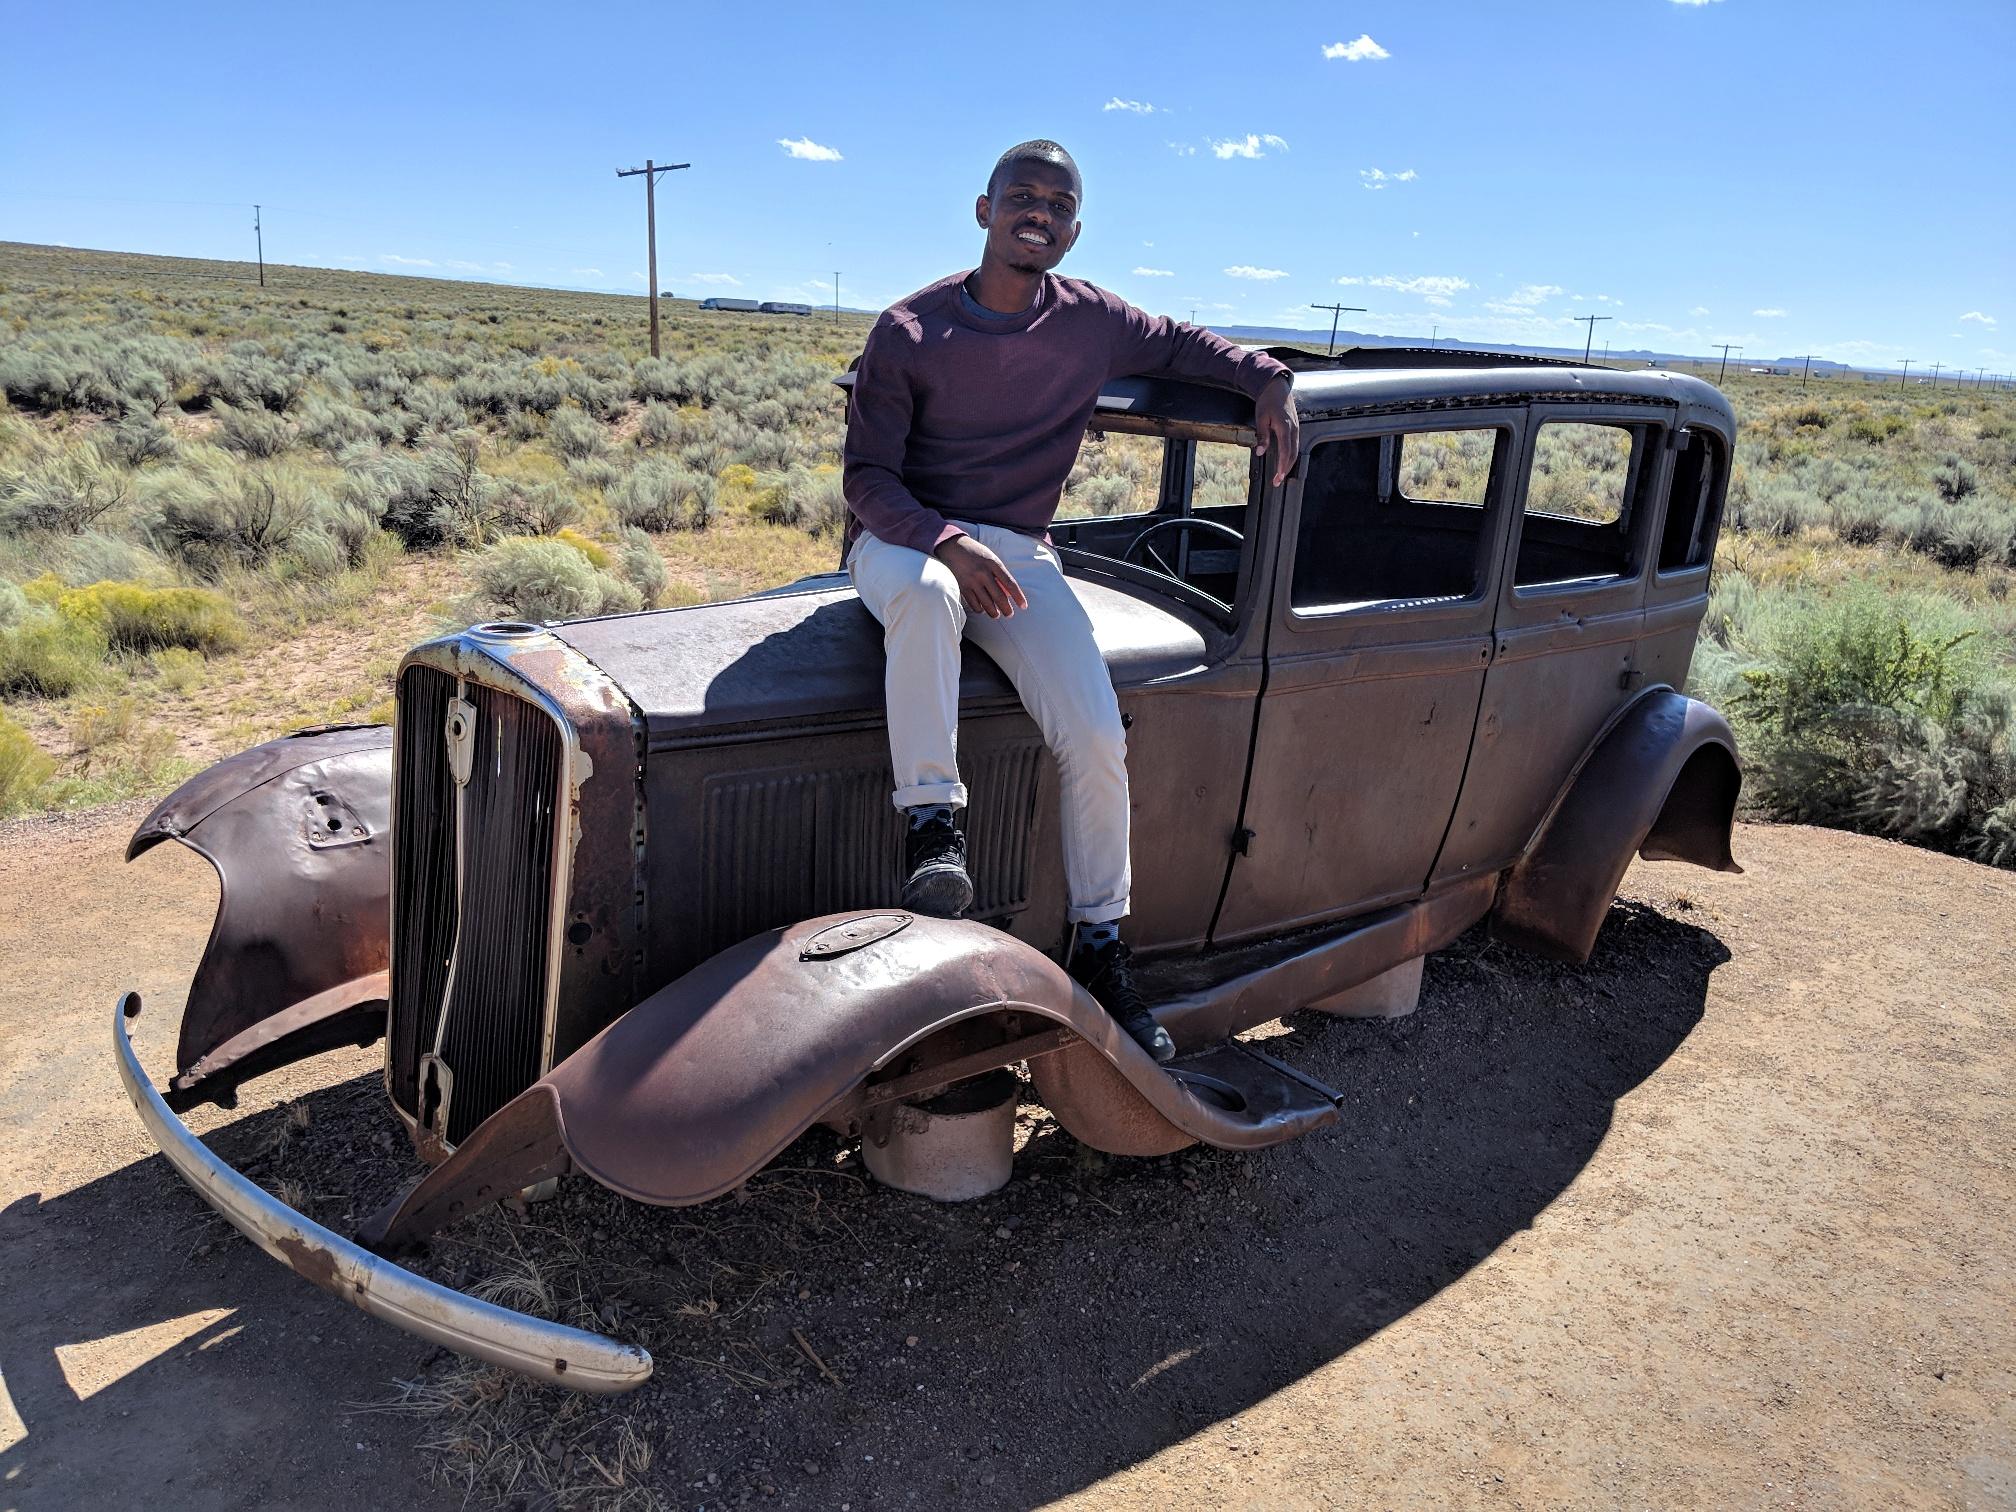 Mtu desert car